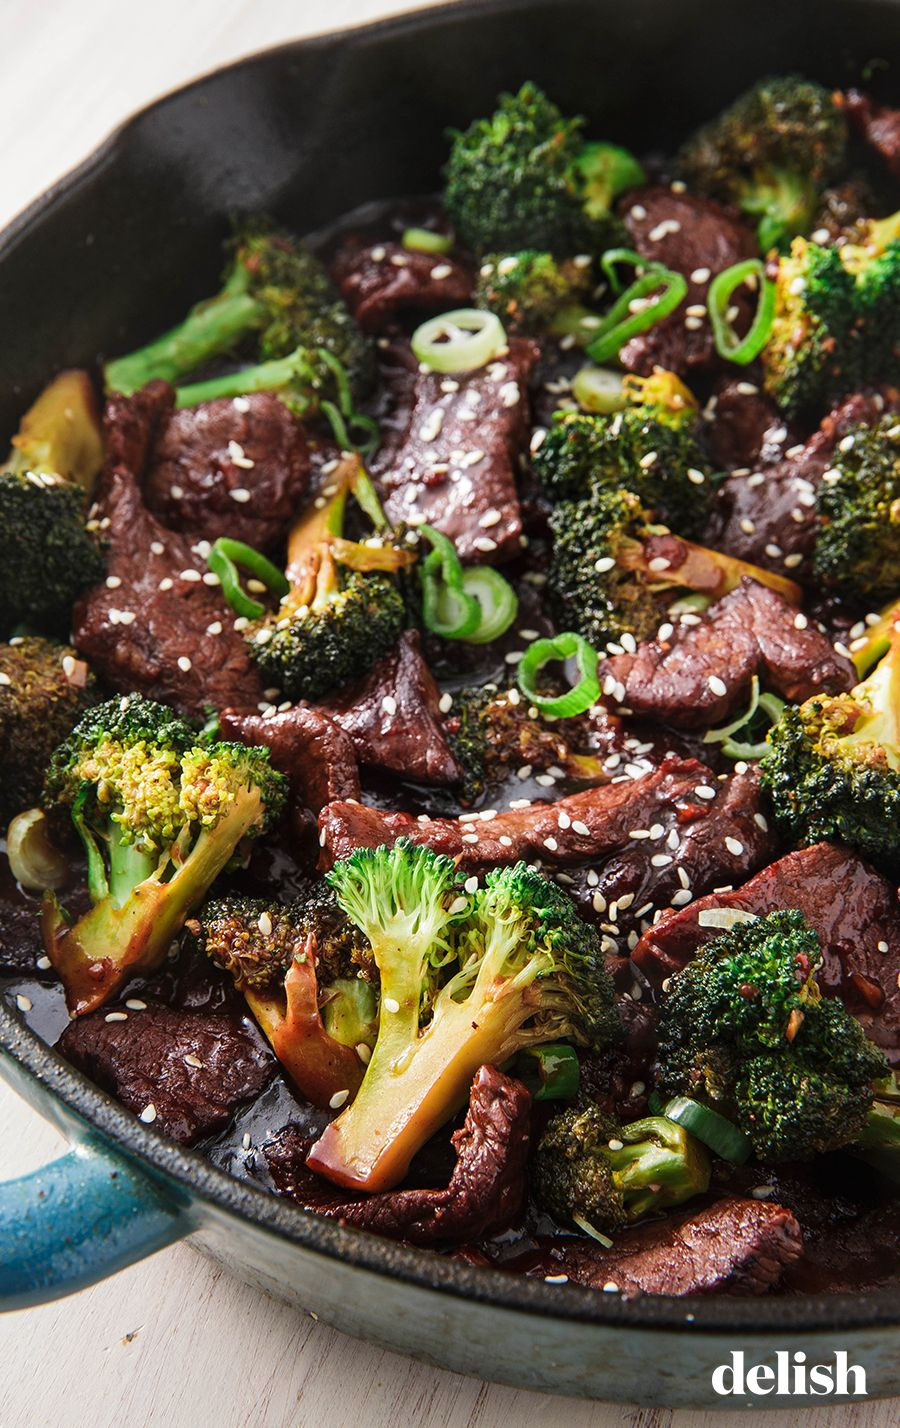 Beef and Broccoli Stir-Fry - Delish.com